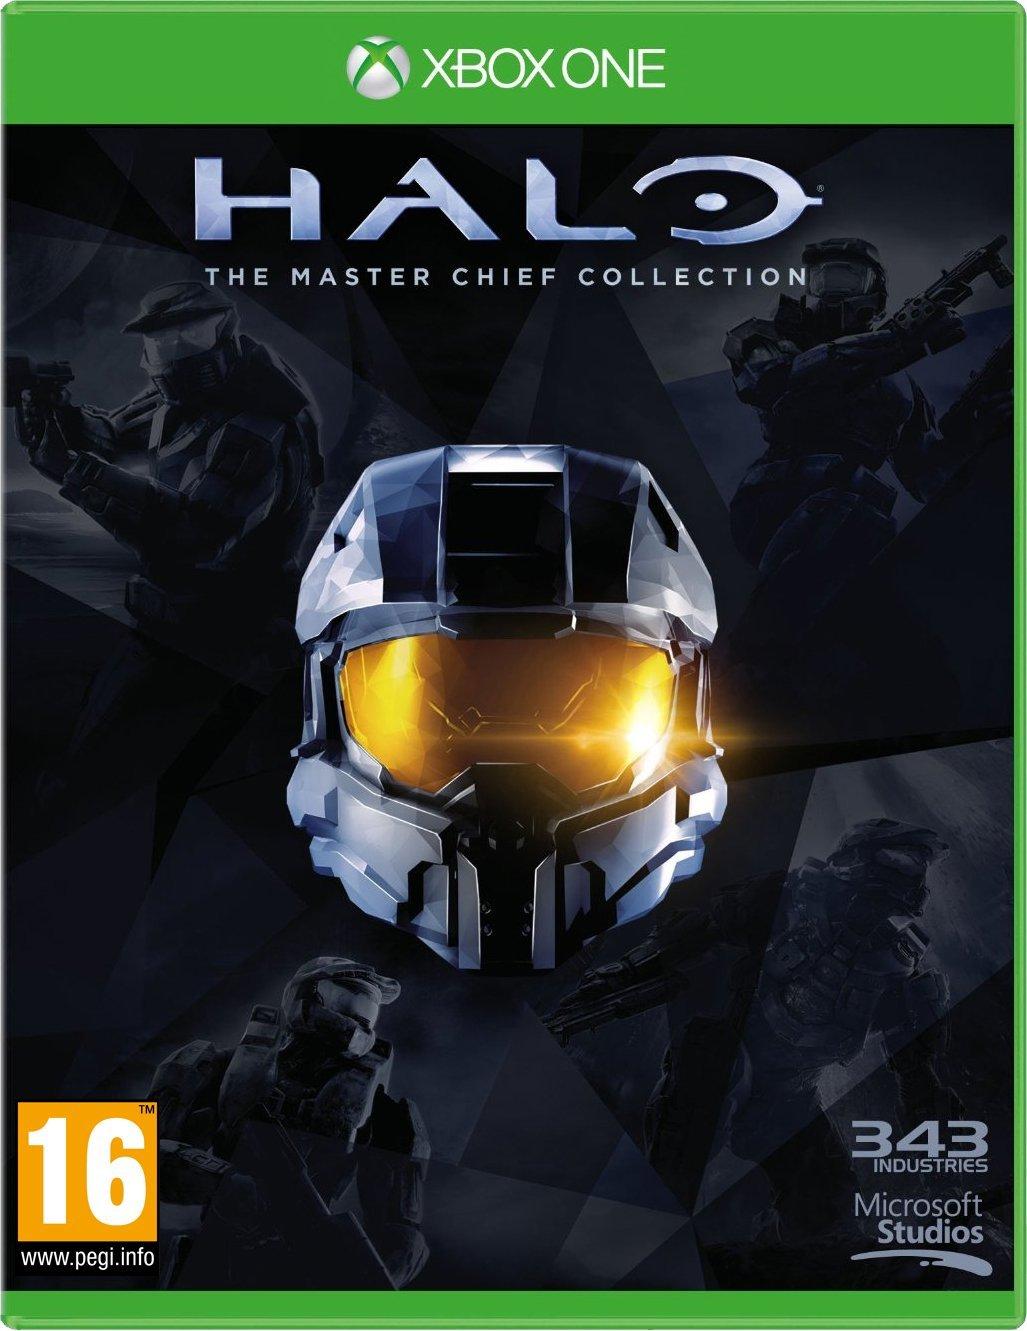 XBOX ONE 最後一戰:士官長合輯(4合一合輯) -中文字幕語音合版- Halo: The Master Chief Collection